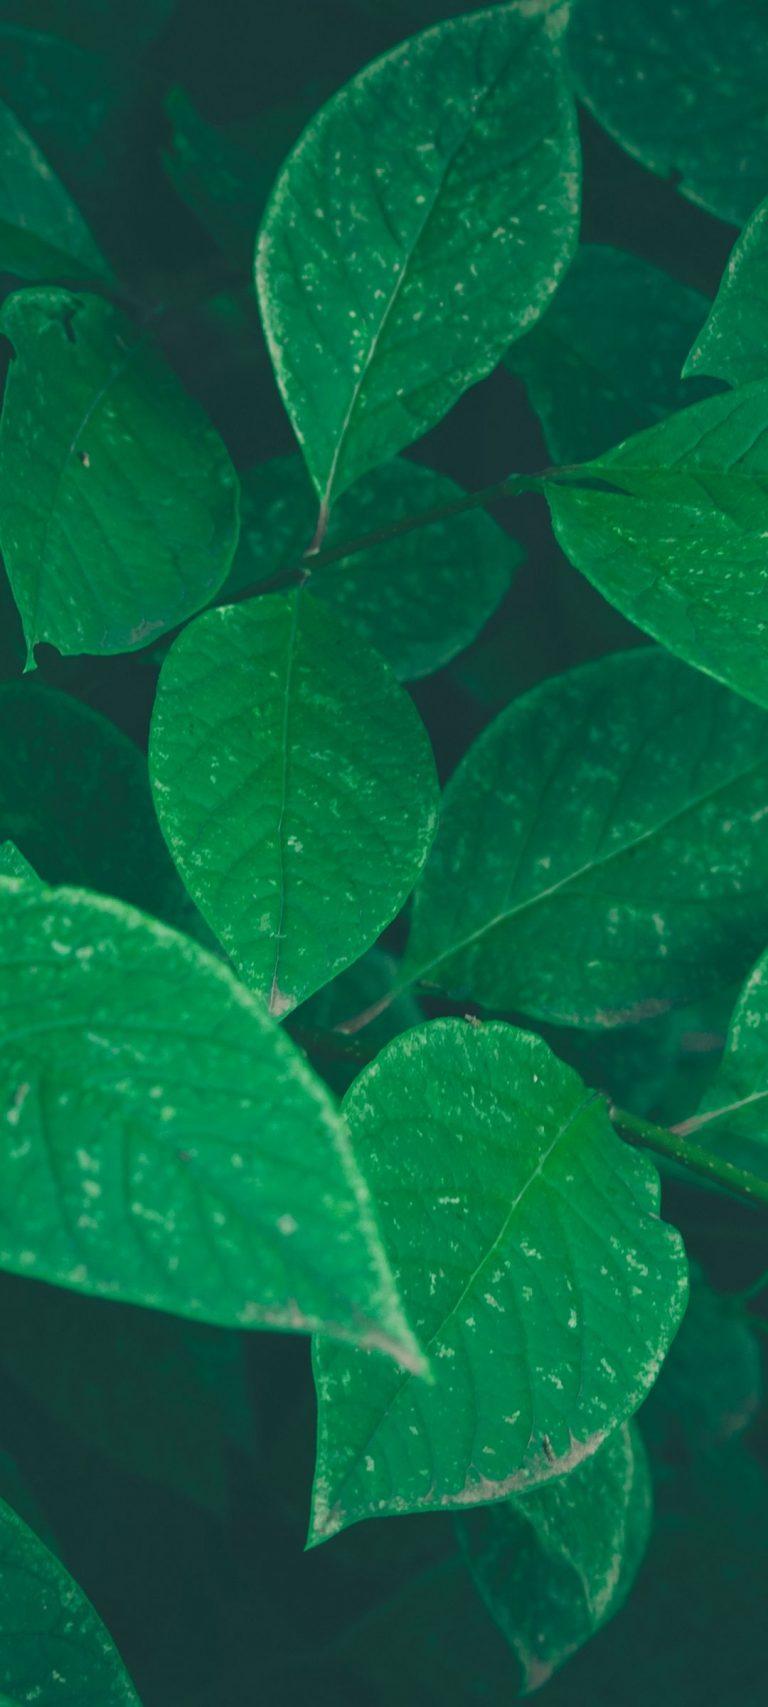 Bushes Leaves Herbs 1080x2400 768x1707